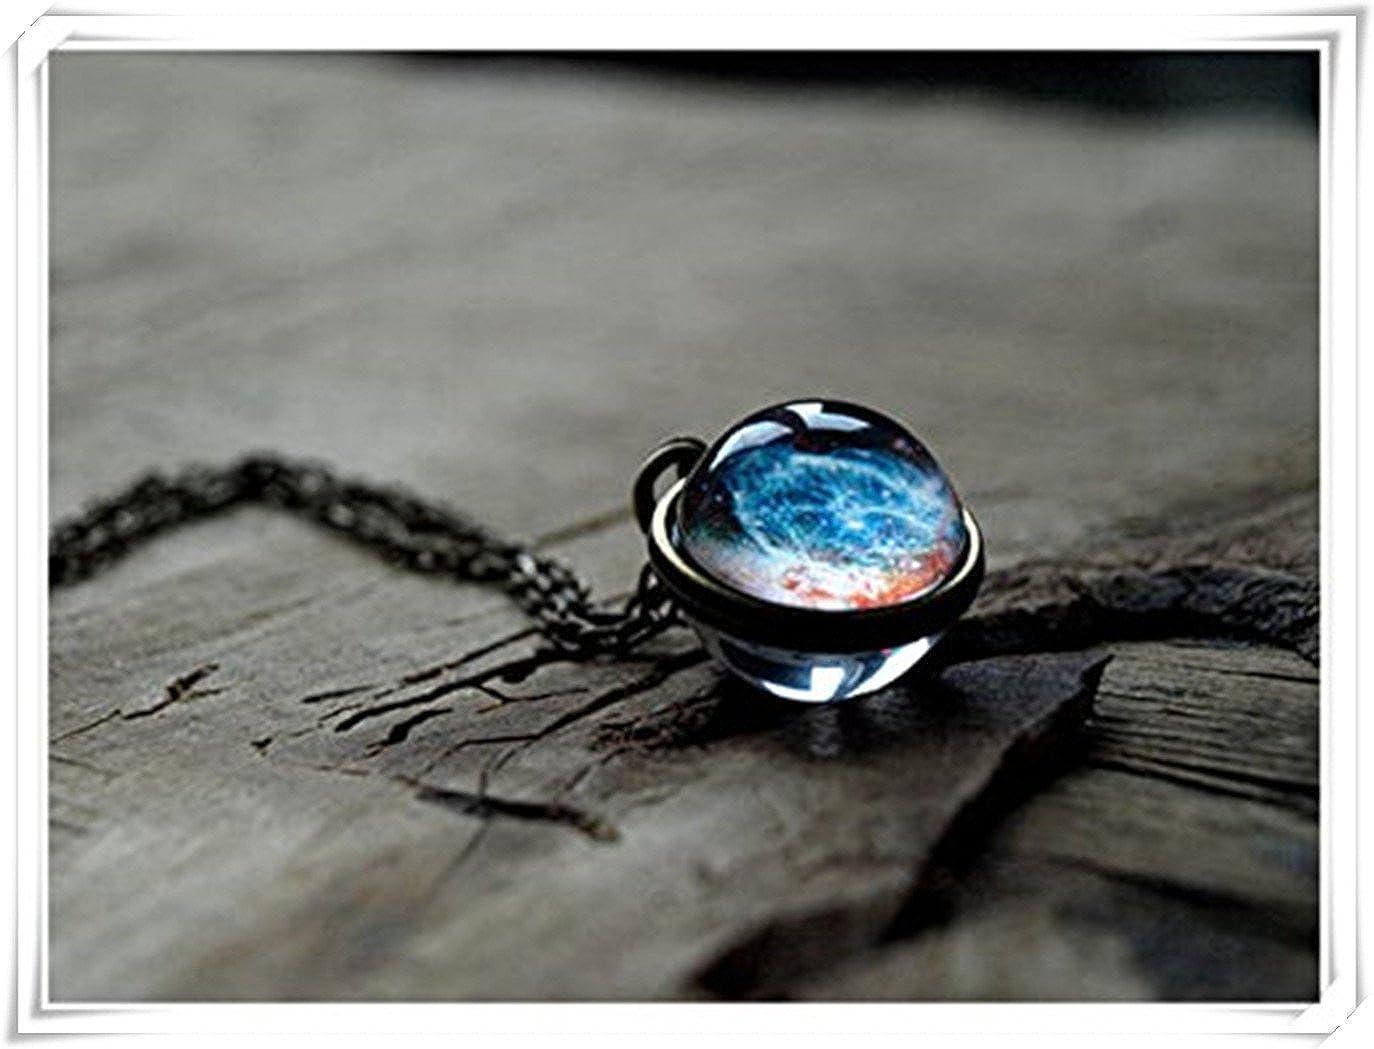 Nebula Collier, Pendentif Space Pendentif, Galaxy, l'univers Pendentif l' univers Pendentif Dandelion chen NU45